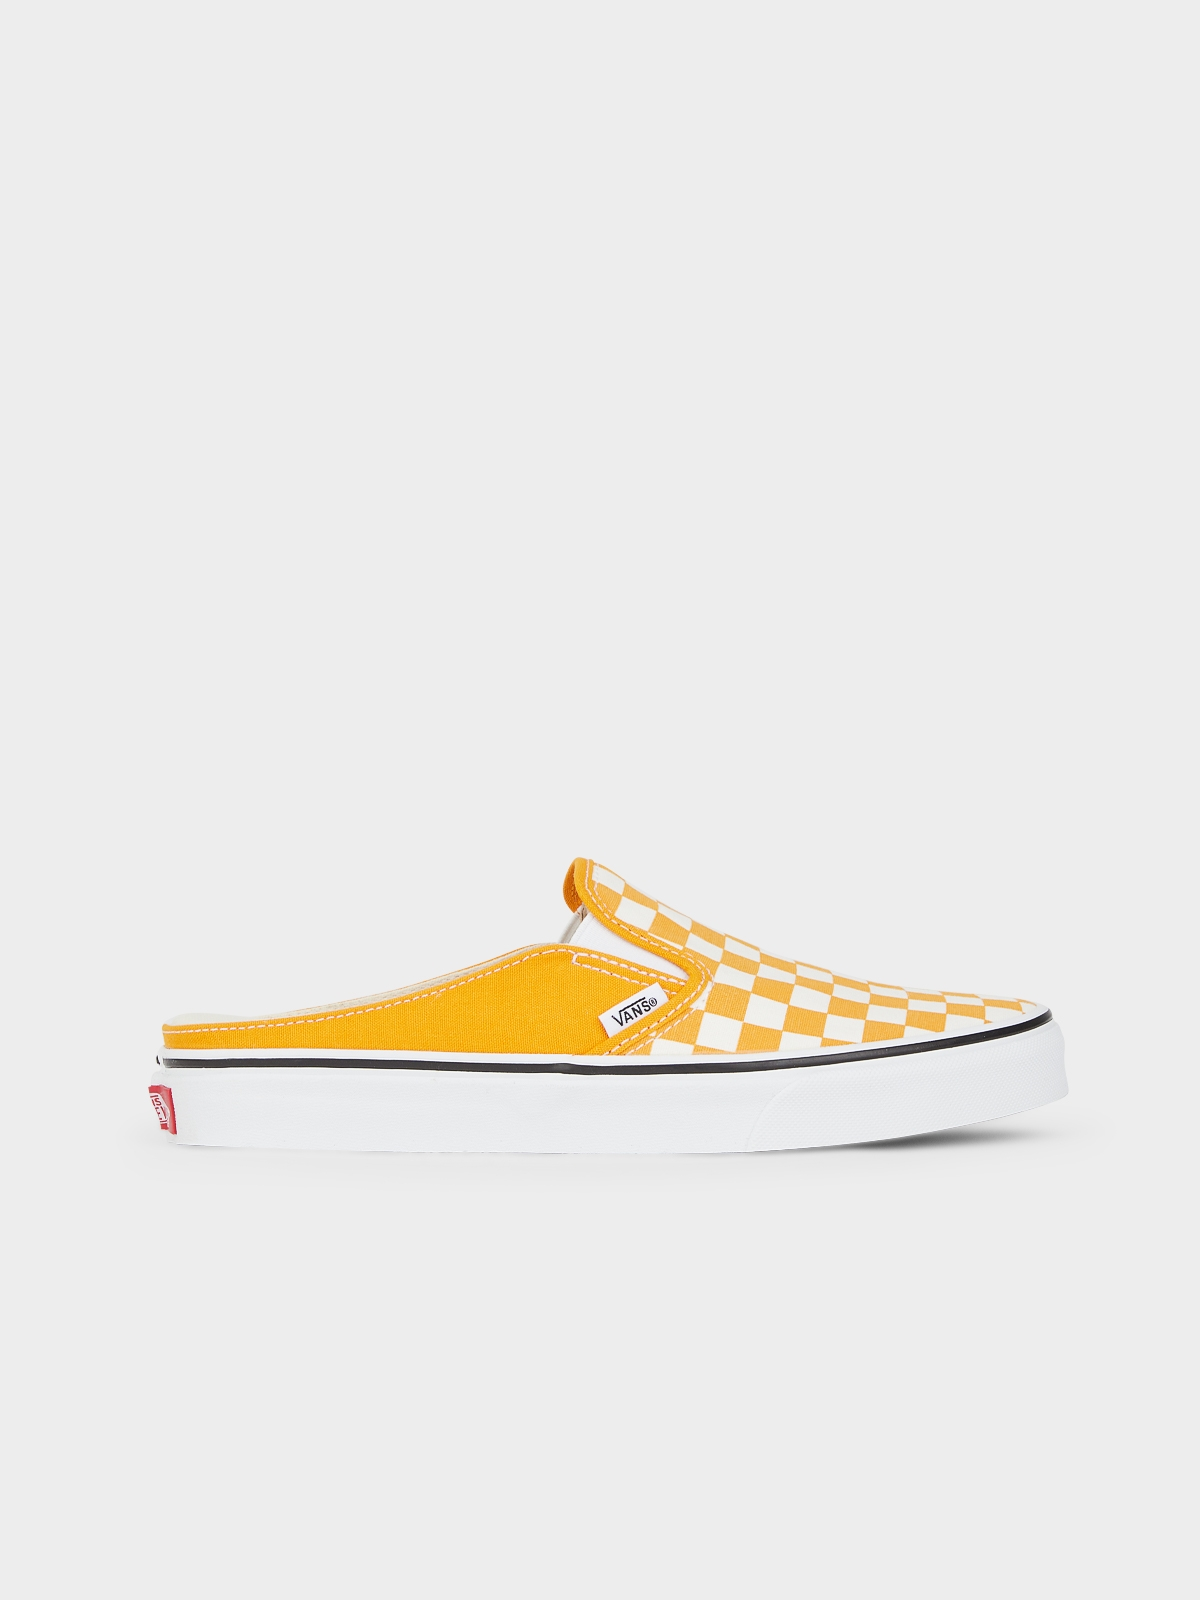 Vans Classic SlipOn Mule Yellow